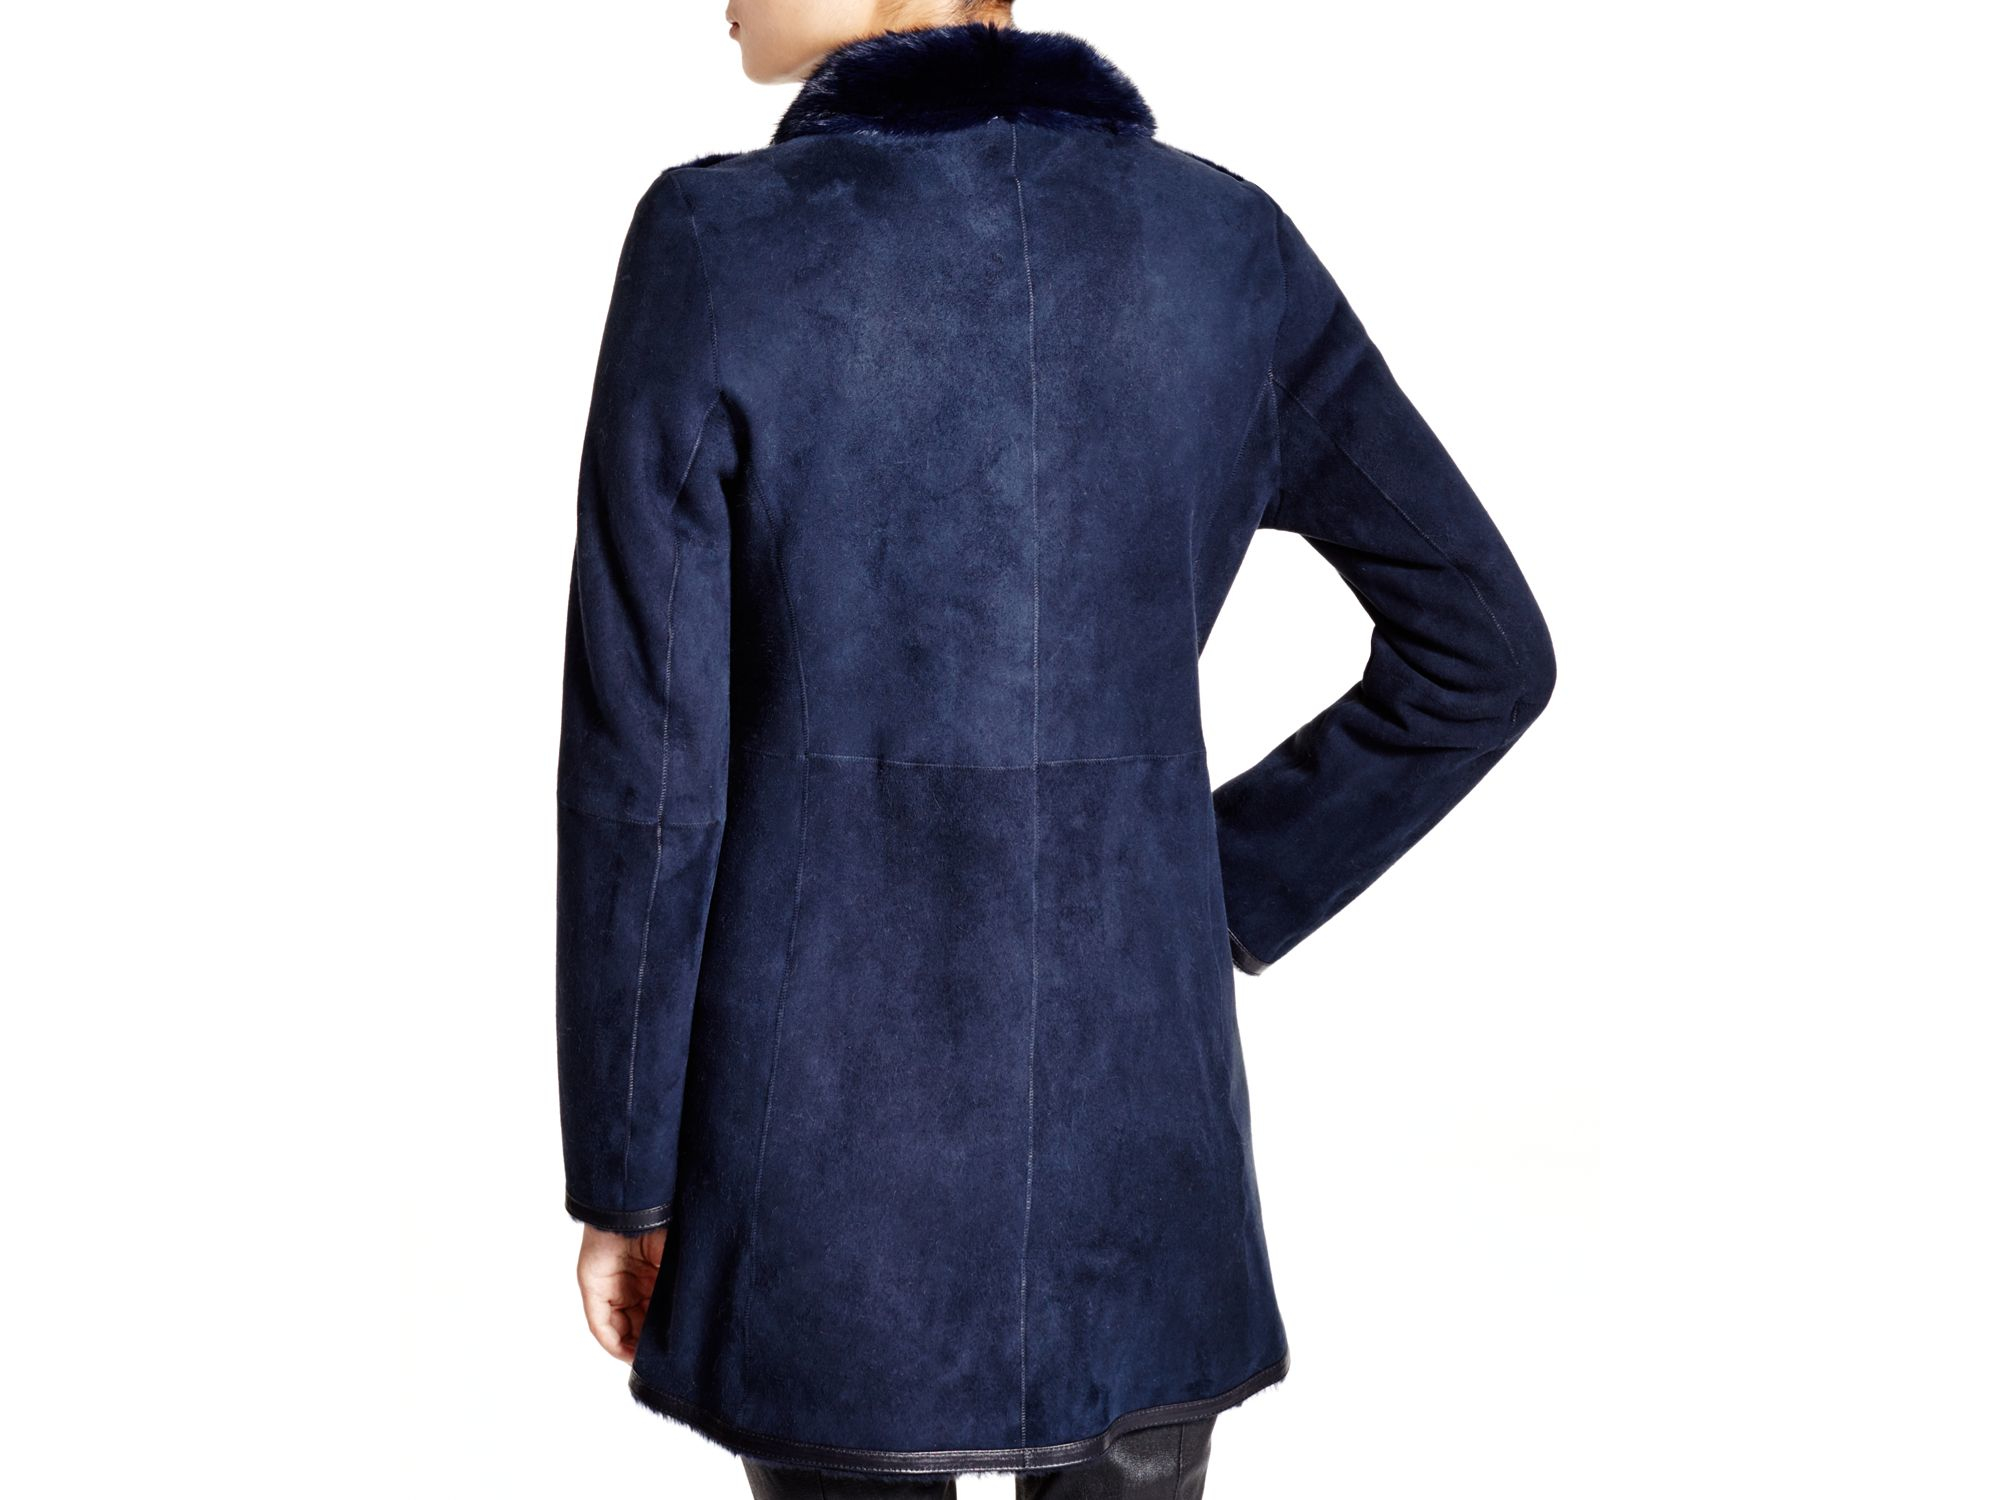 Maximilian Maximilian Lamb Shearling Coat With Mink Collar in Blue